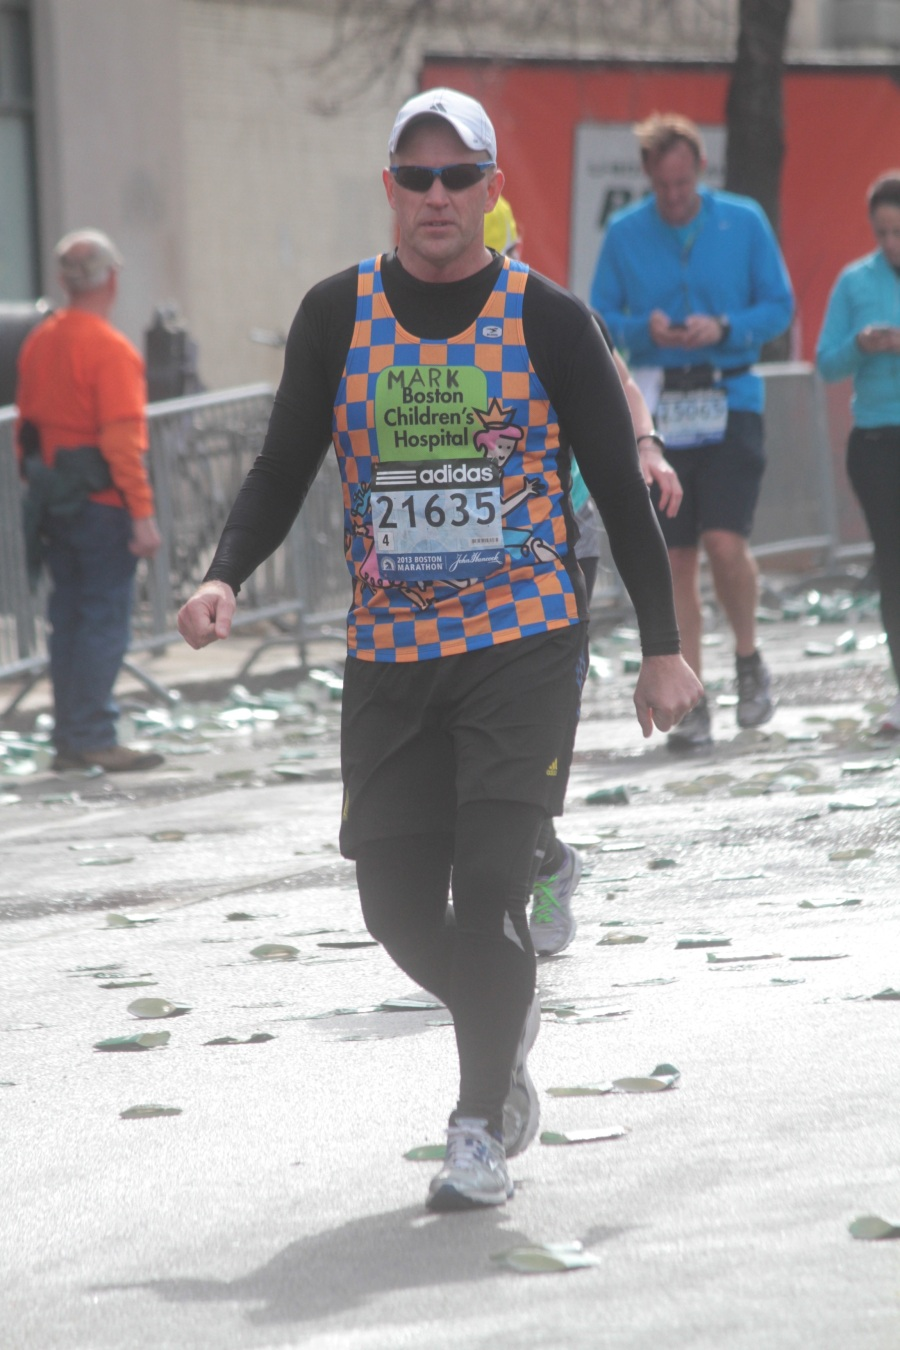 boston marathon 2013 number 21634